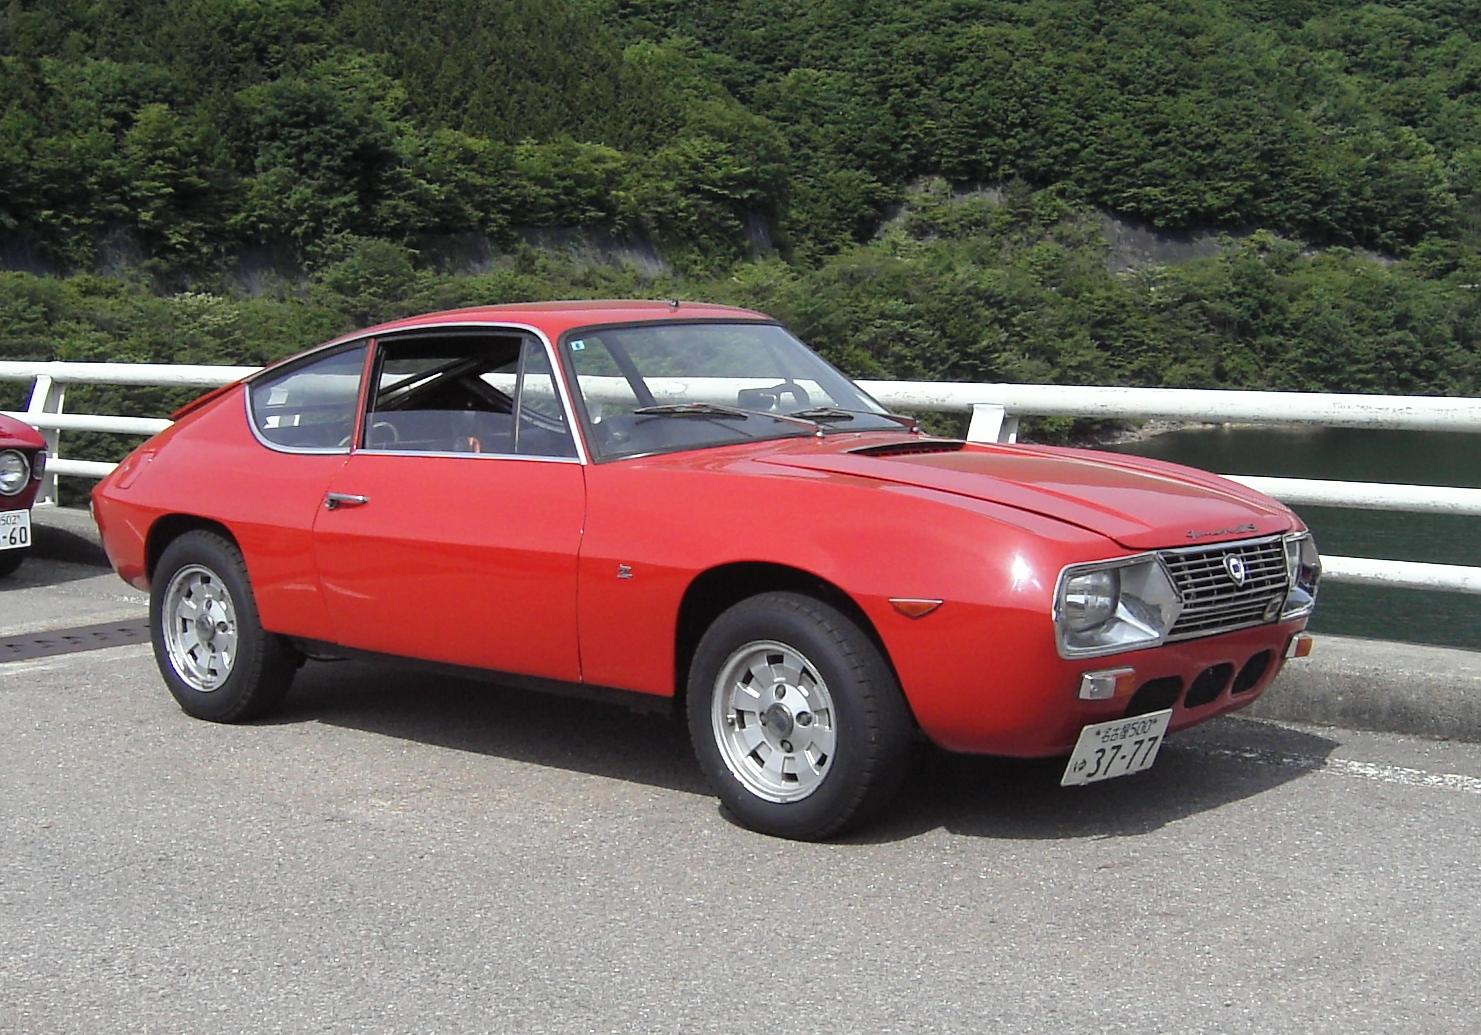 http://zagatoclub.jp/cars/23141409.JPG